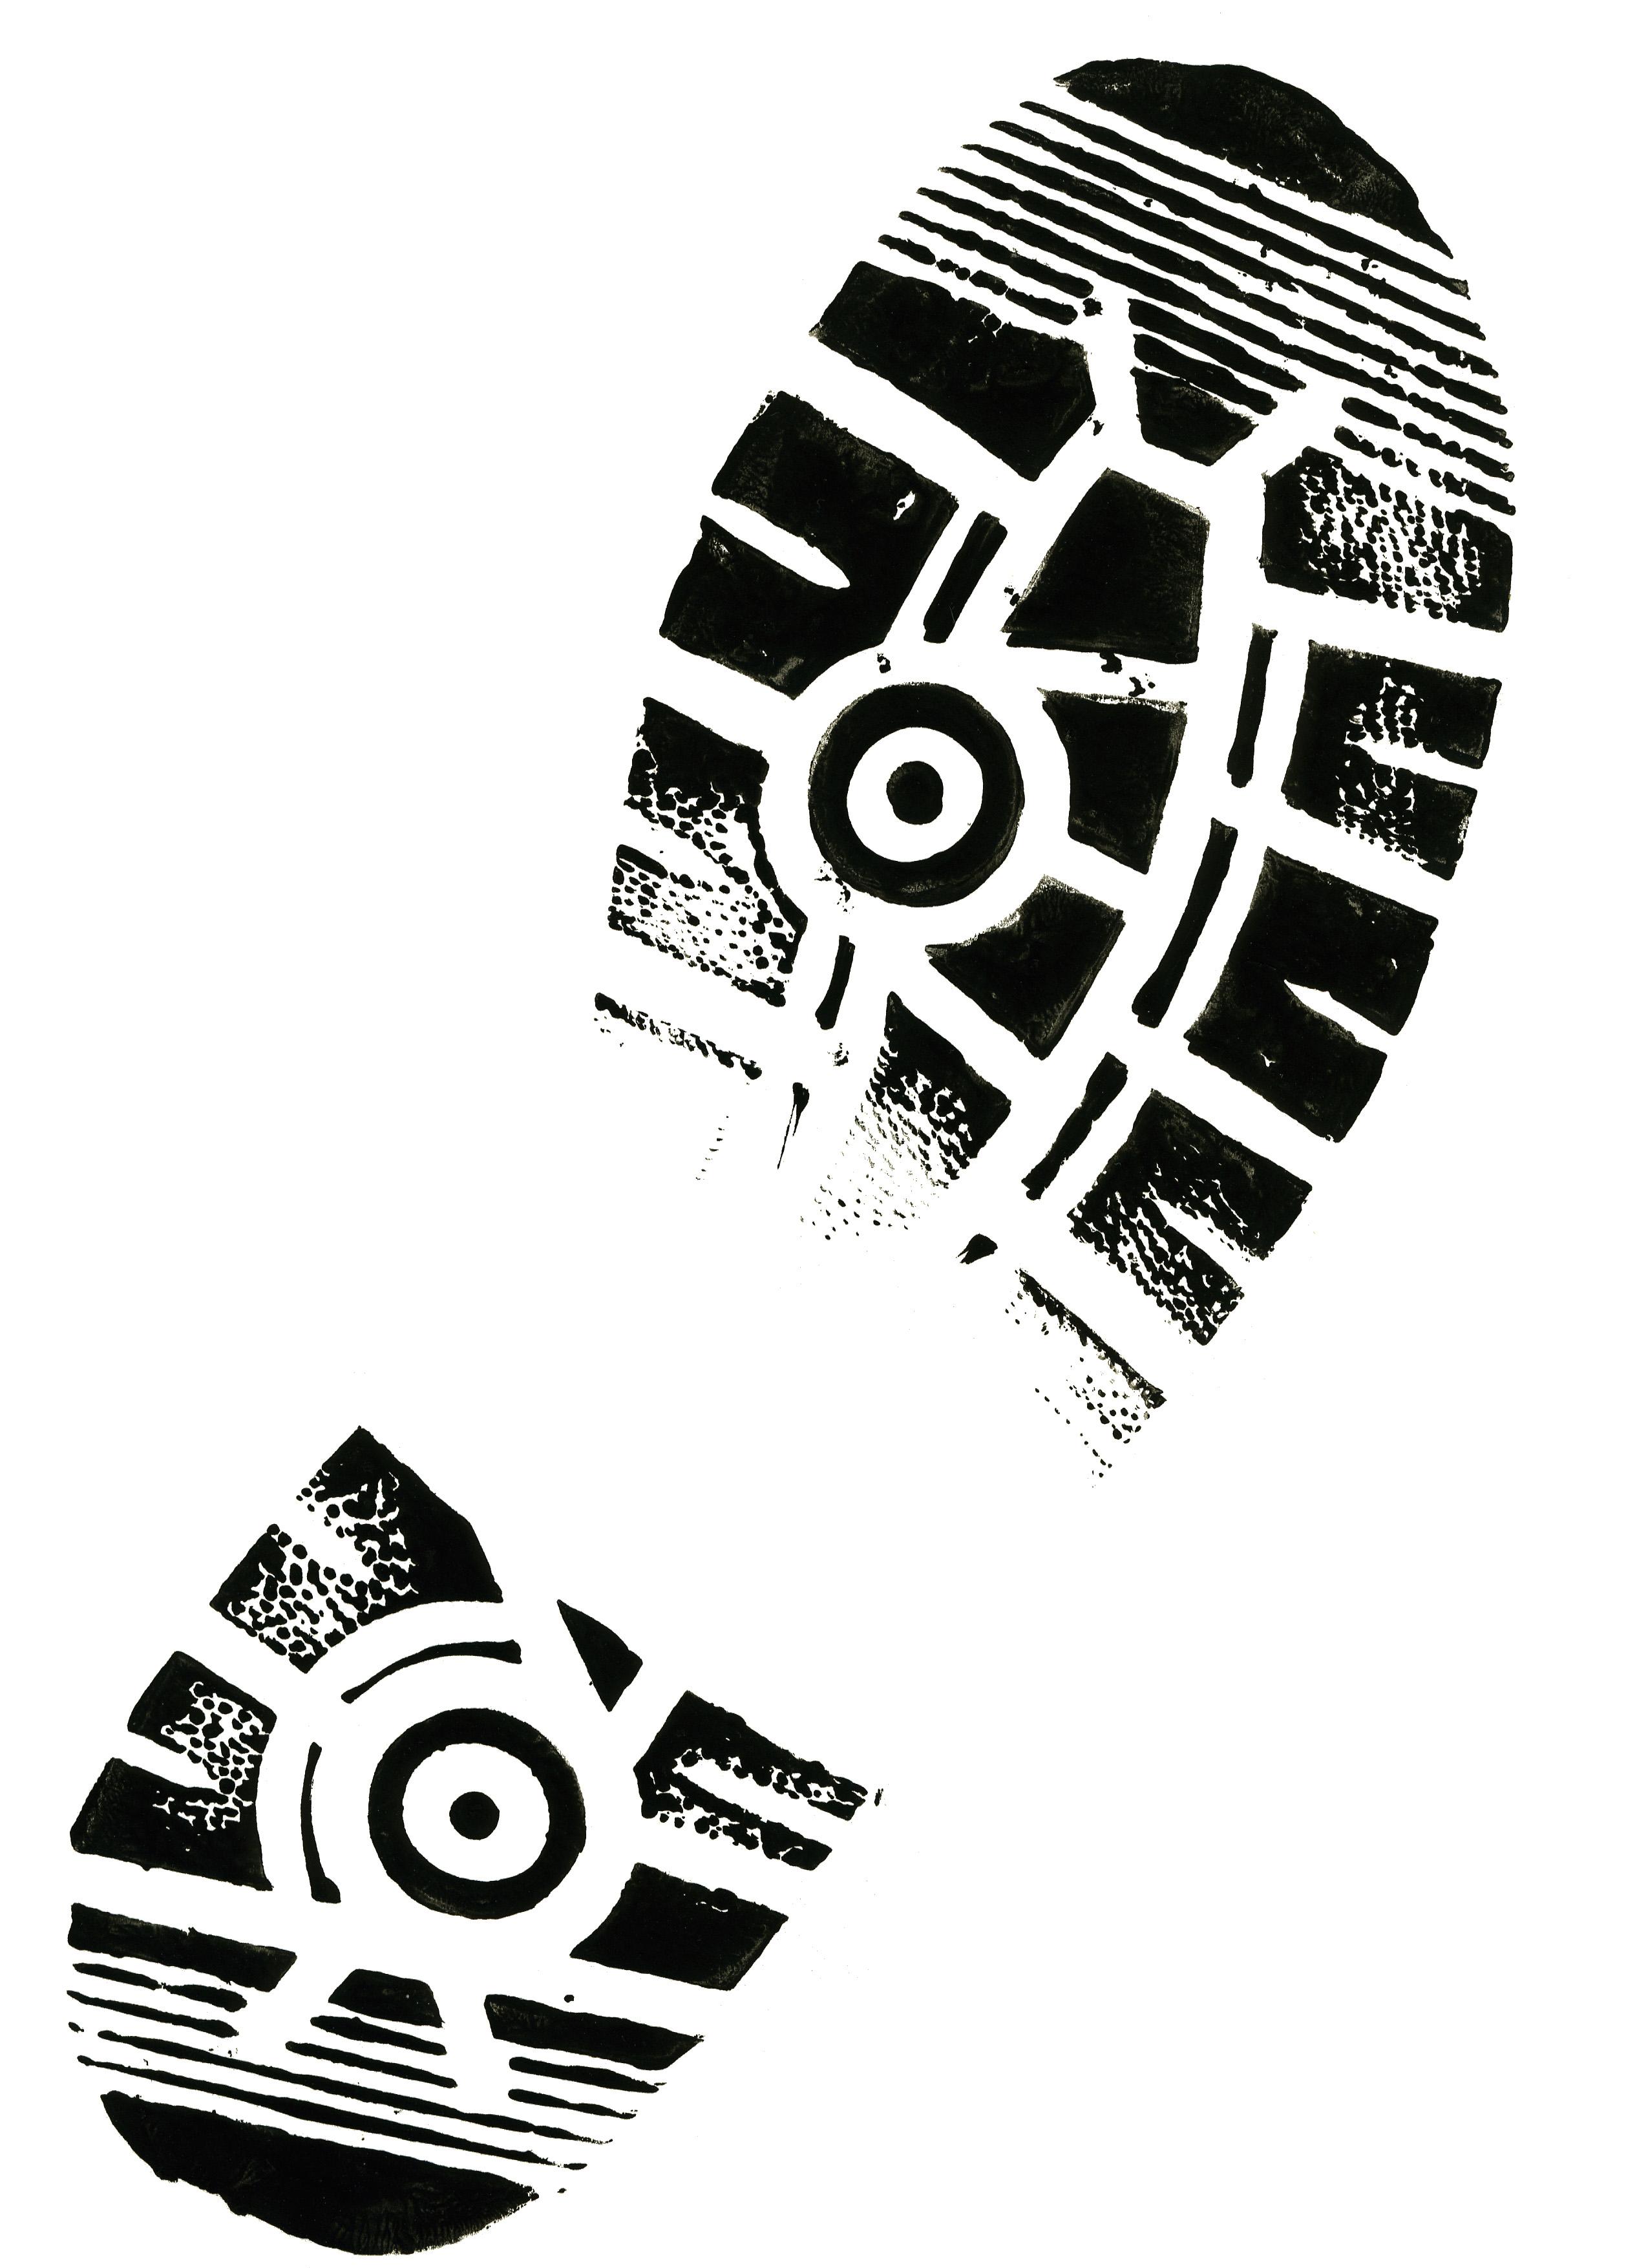 Footprint clipart rubber shoe Shoes Clipart print Running Shoe